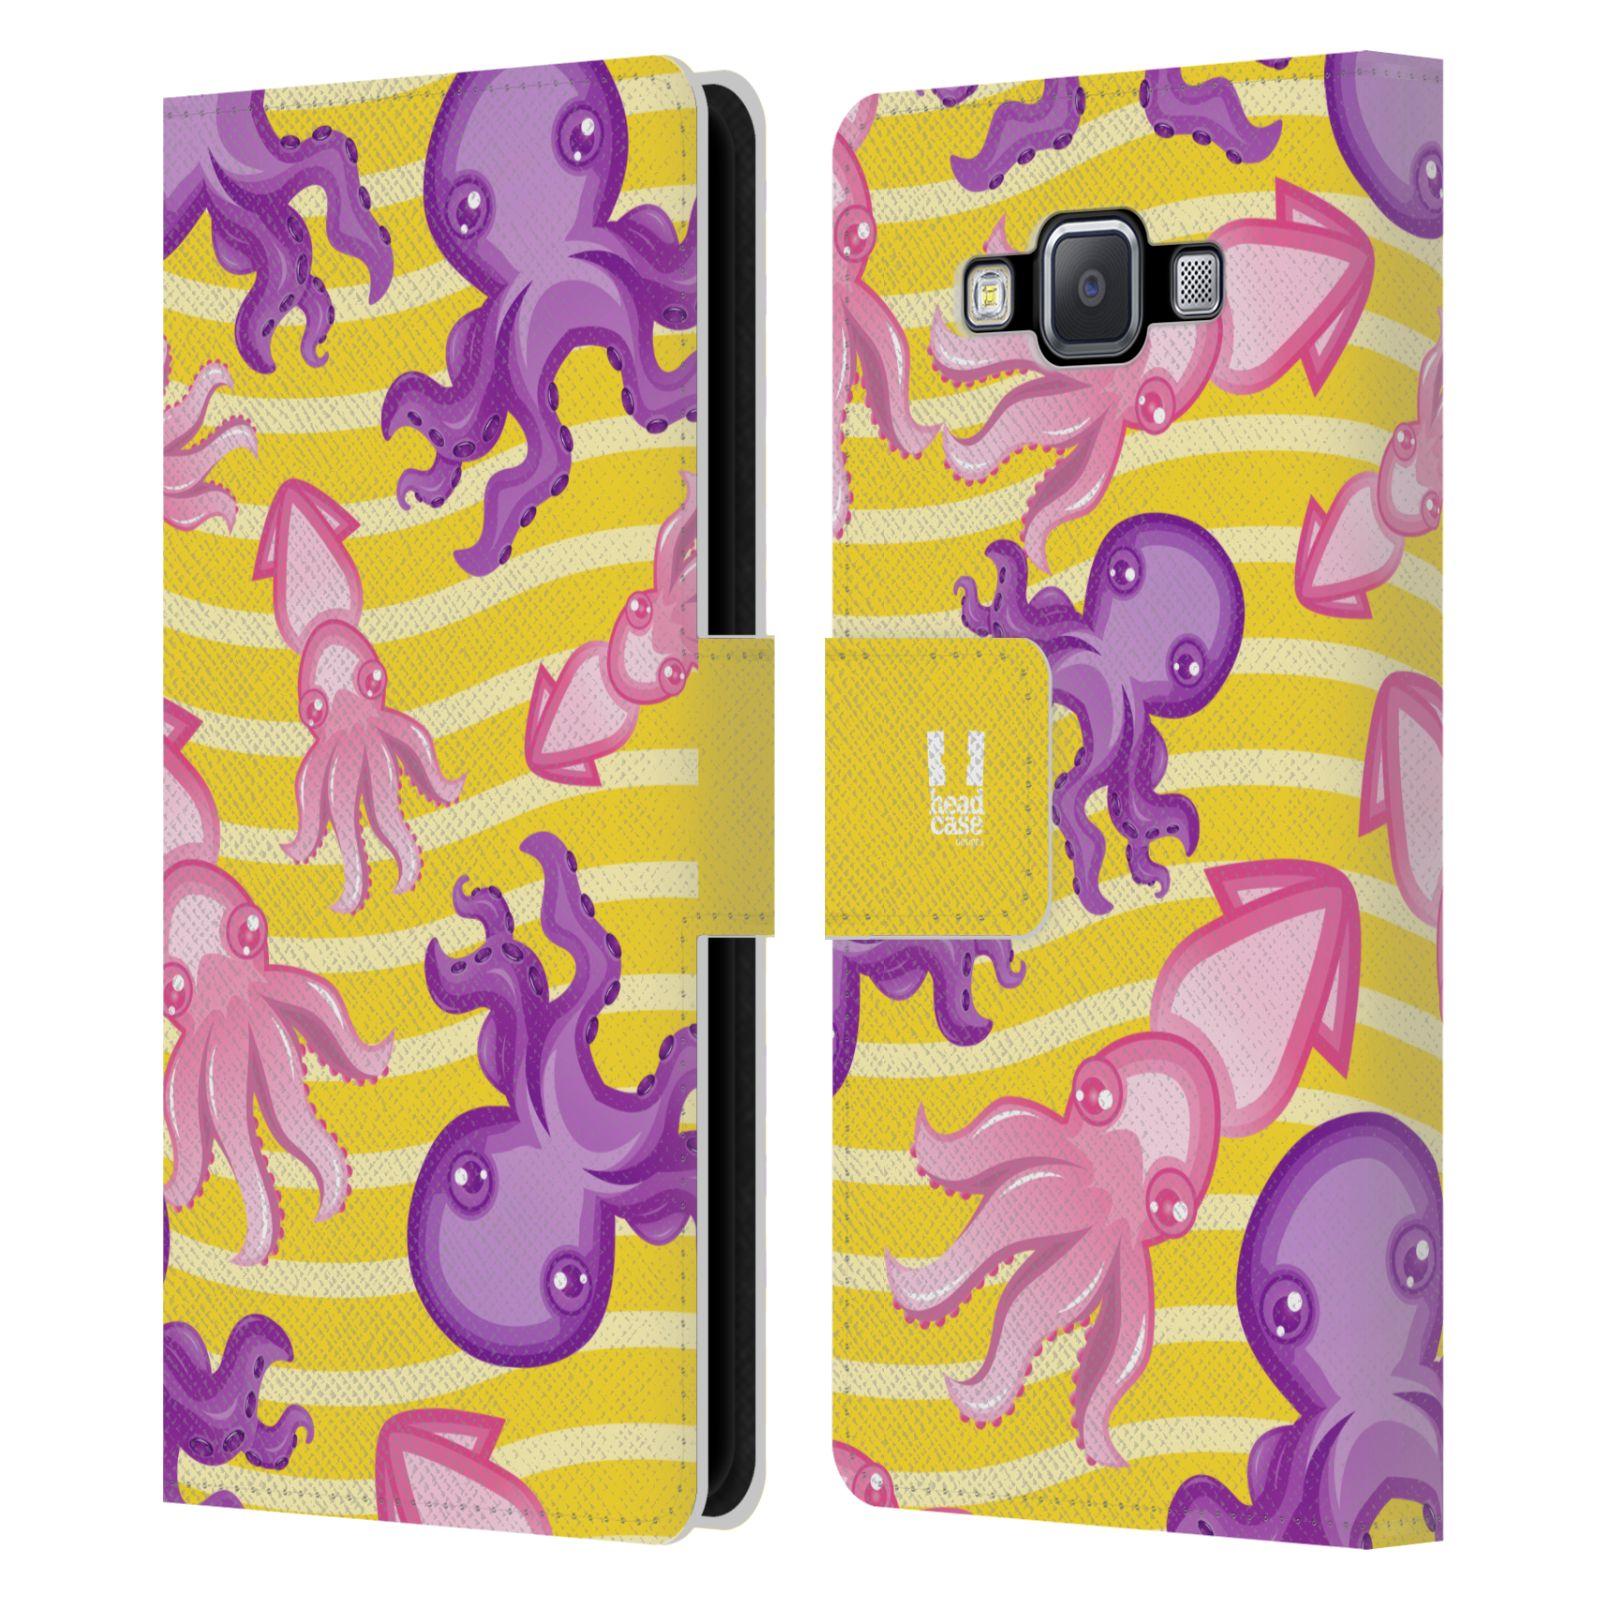 HEAD CASE Flipové pouzdro pro mobil Samsung Galaxy A5 Mořský živočich chobotnice a krakatice žlutá barva